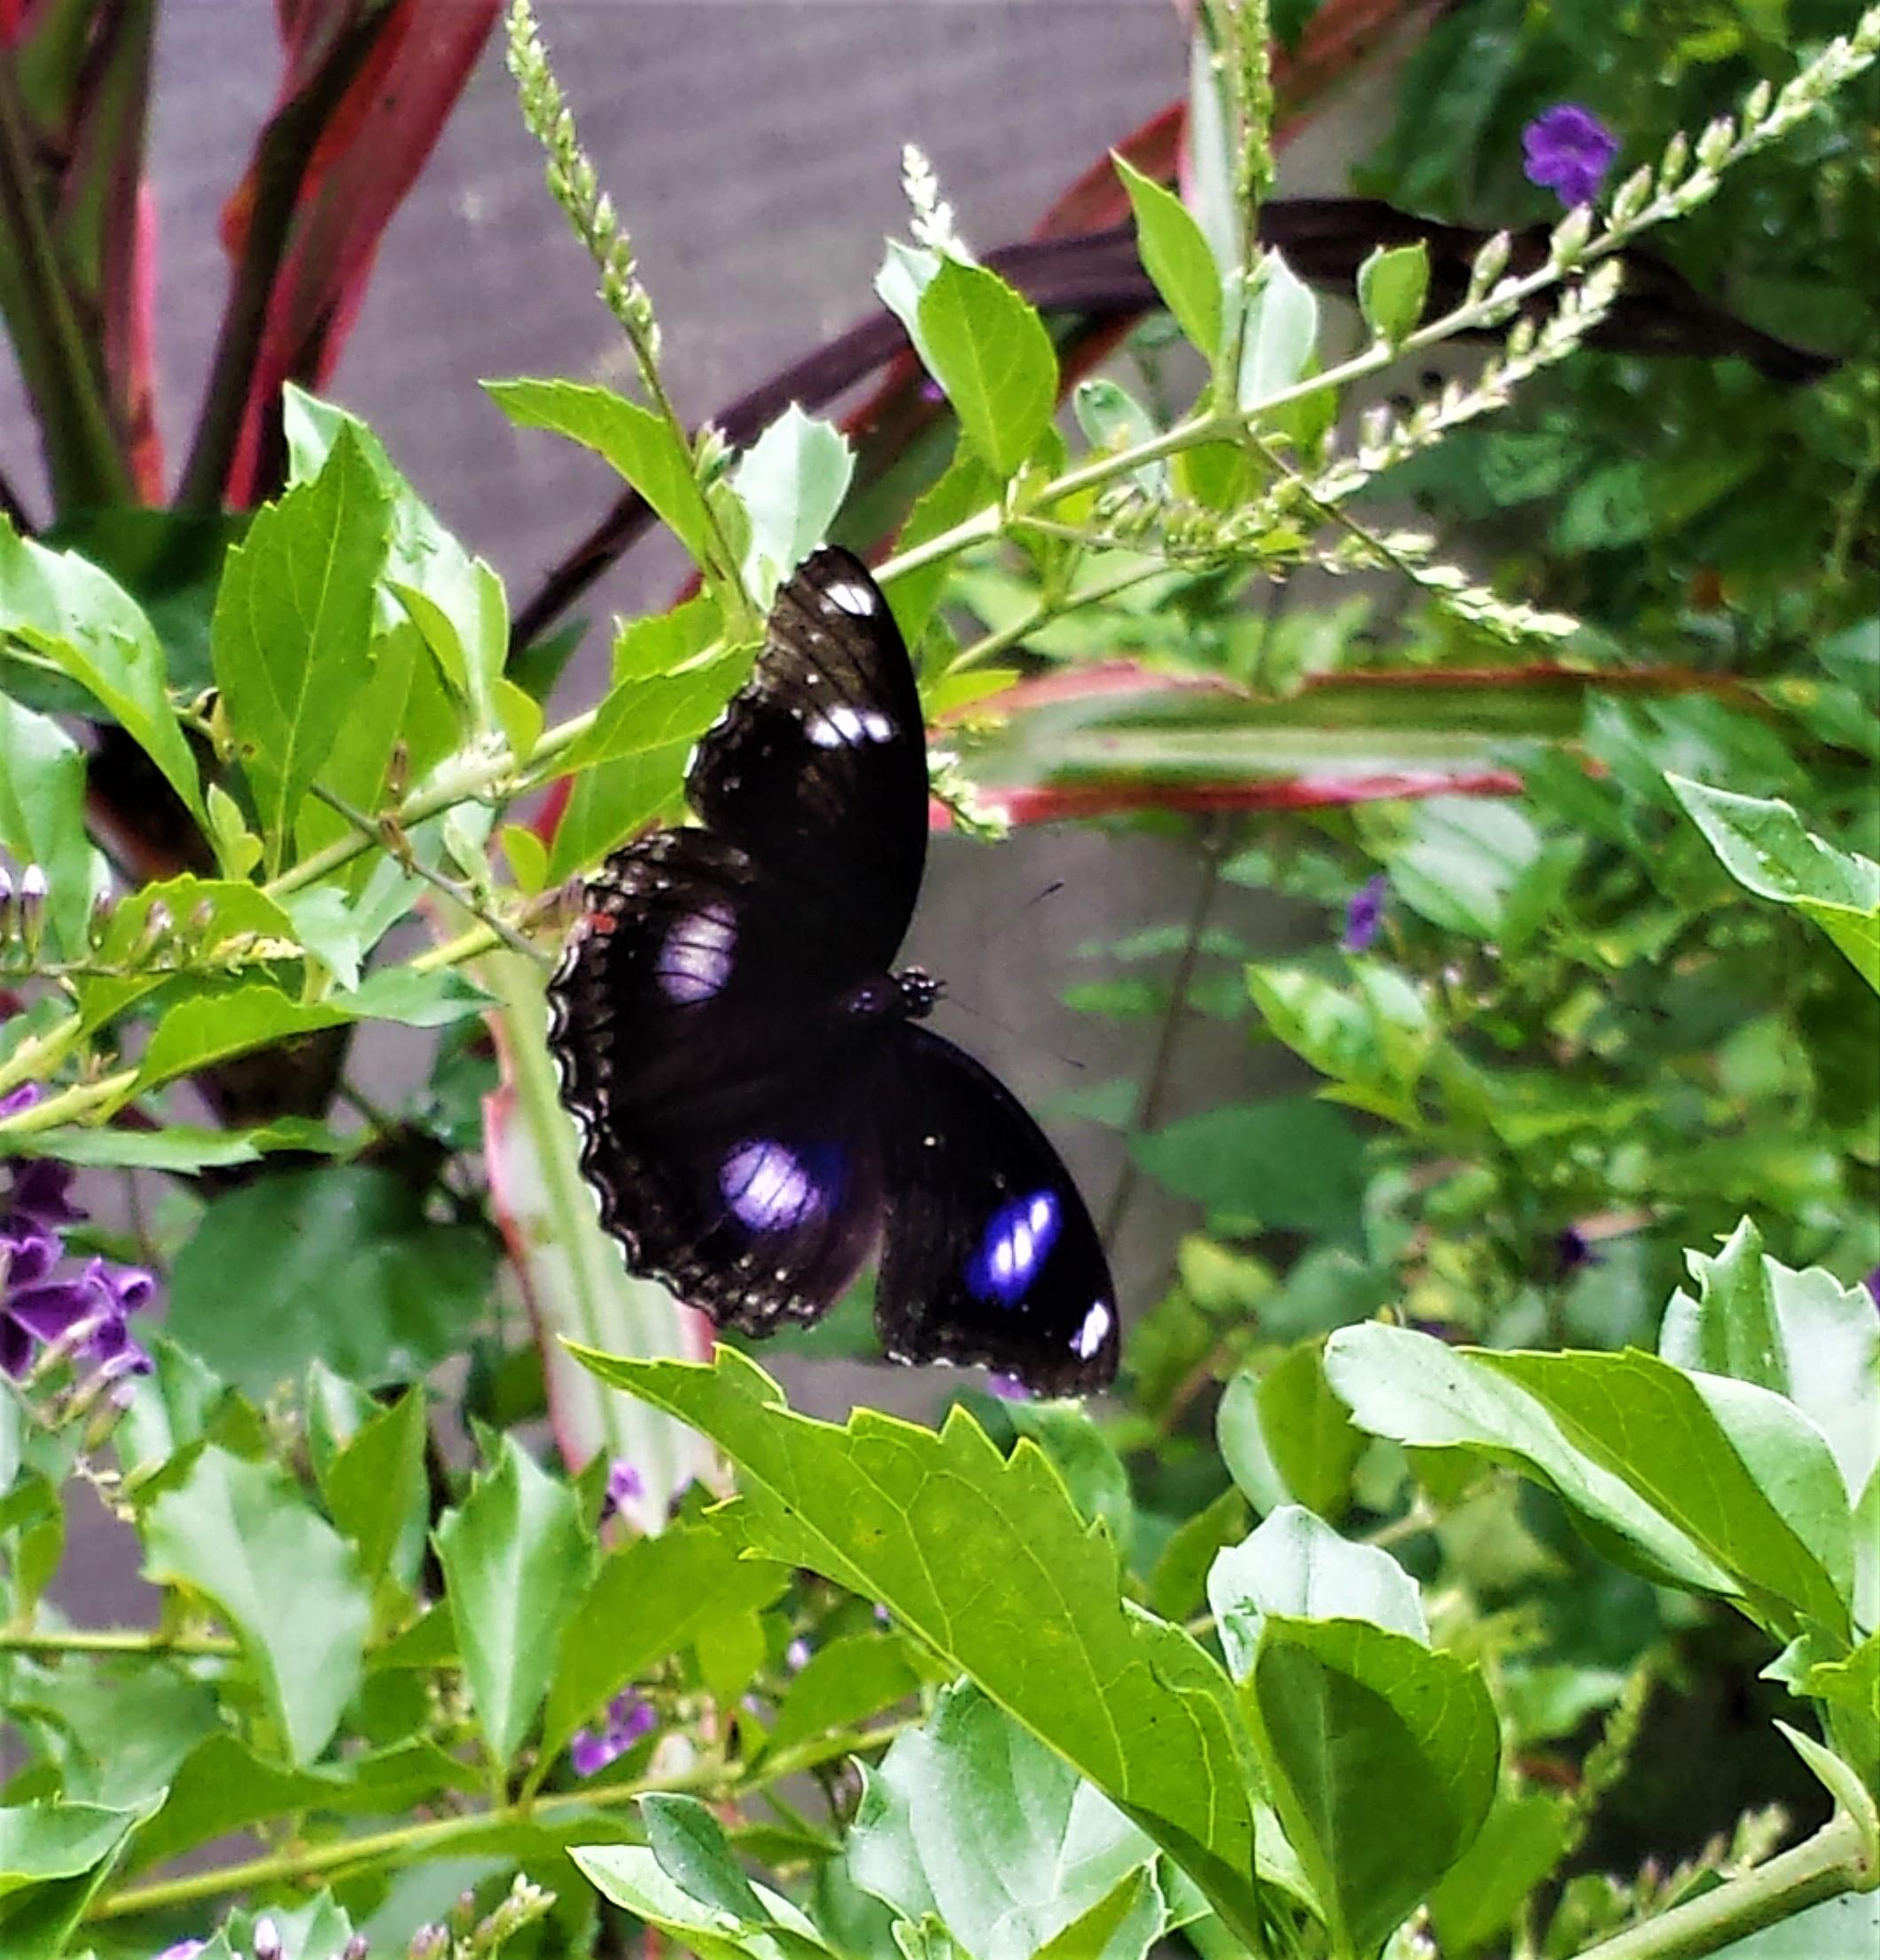 On delicate wings NaamaYehuda